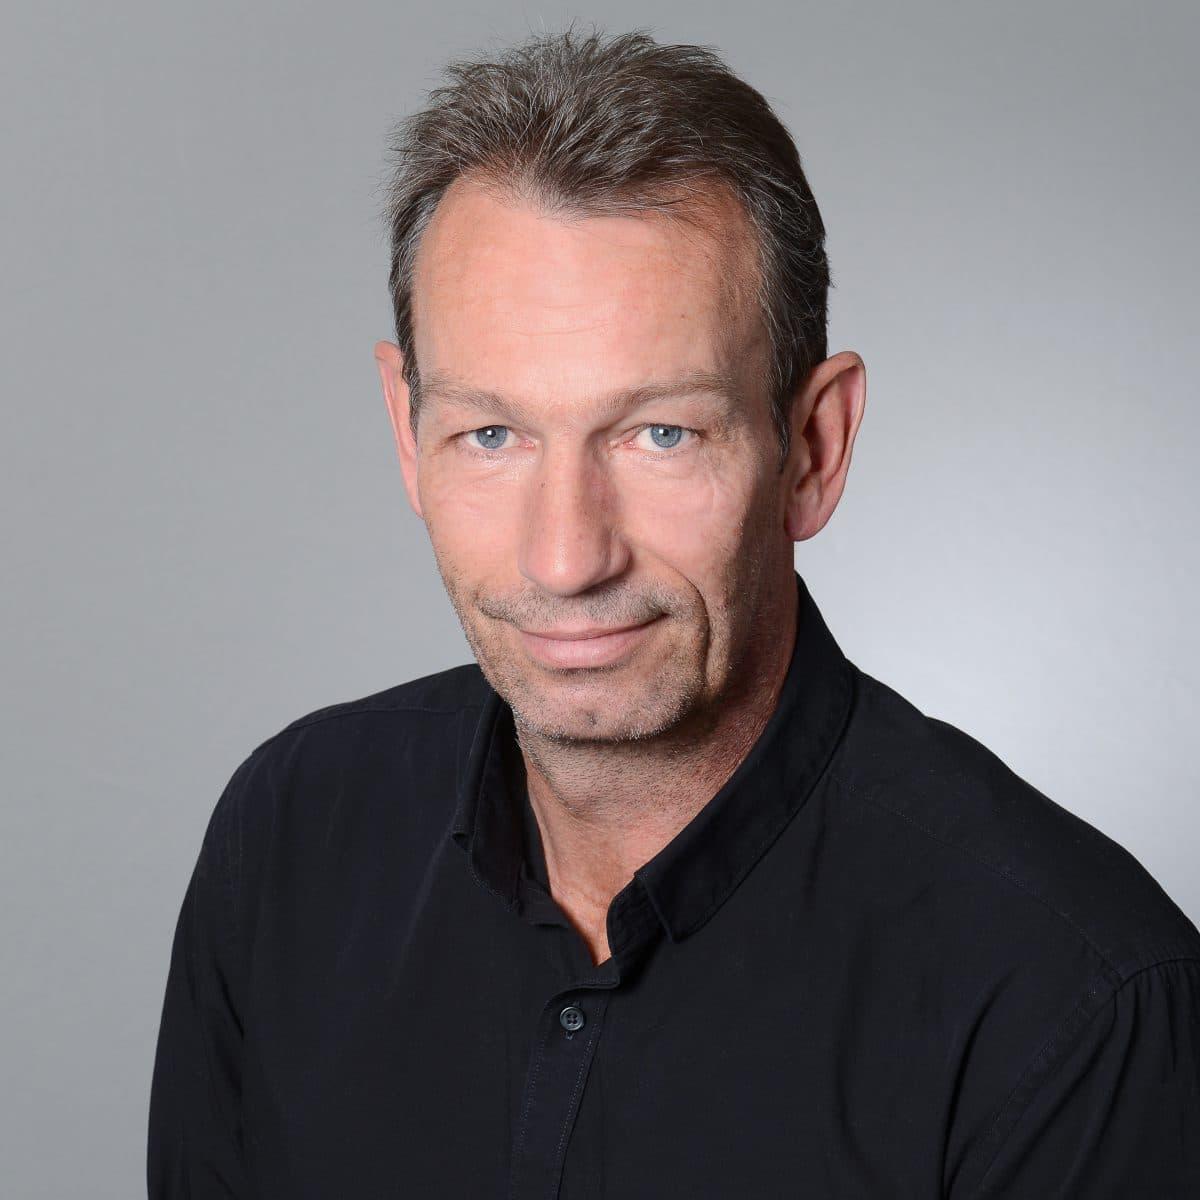 Wolfgang Jeschke Profilfoto